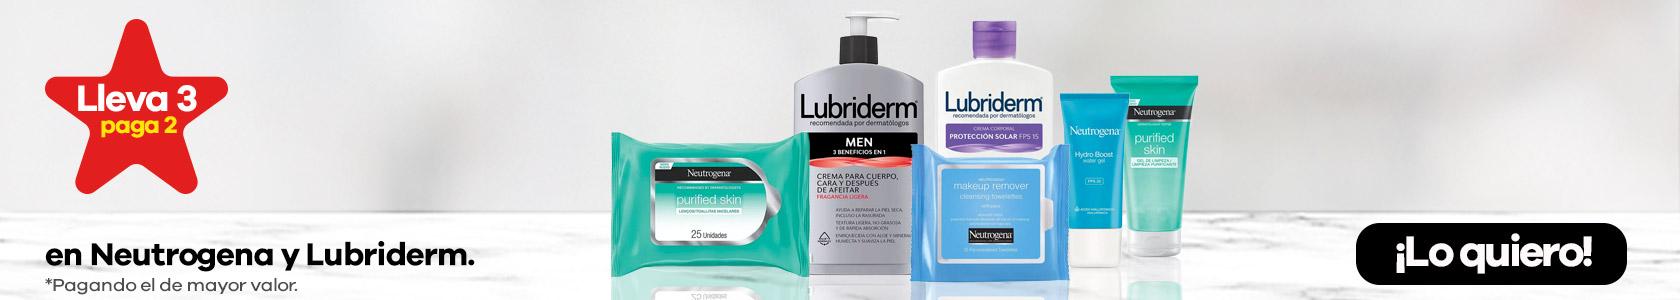 Neutrogena y Lubriderm